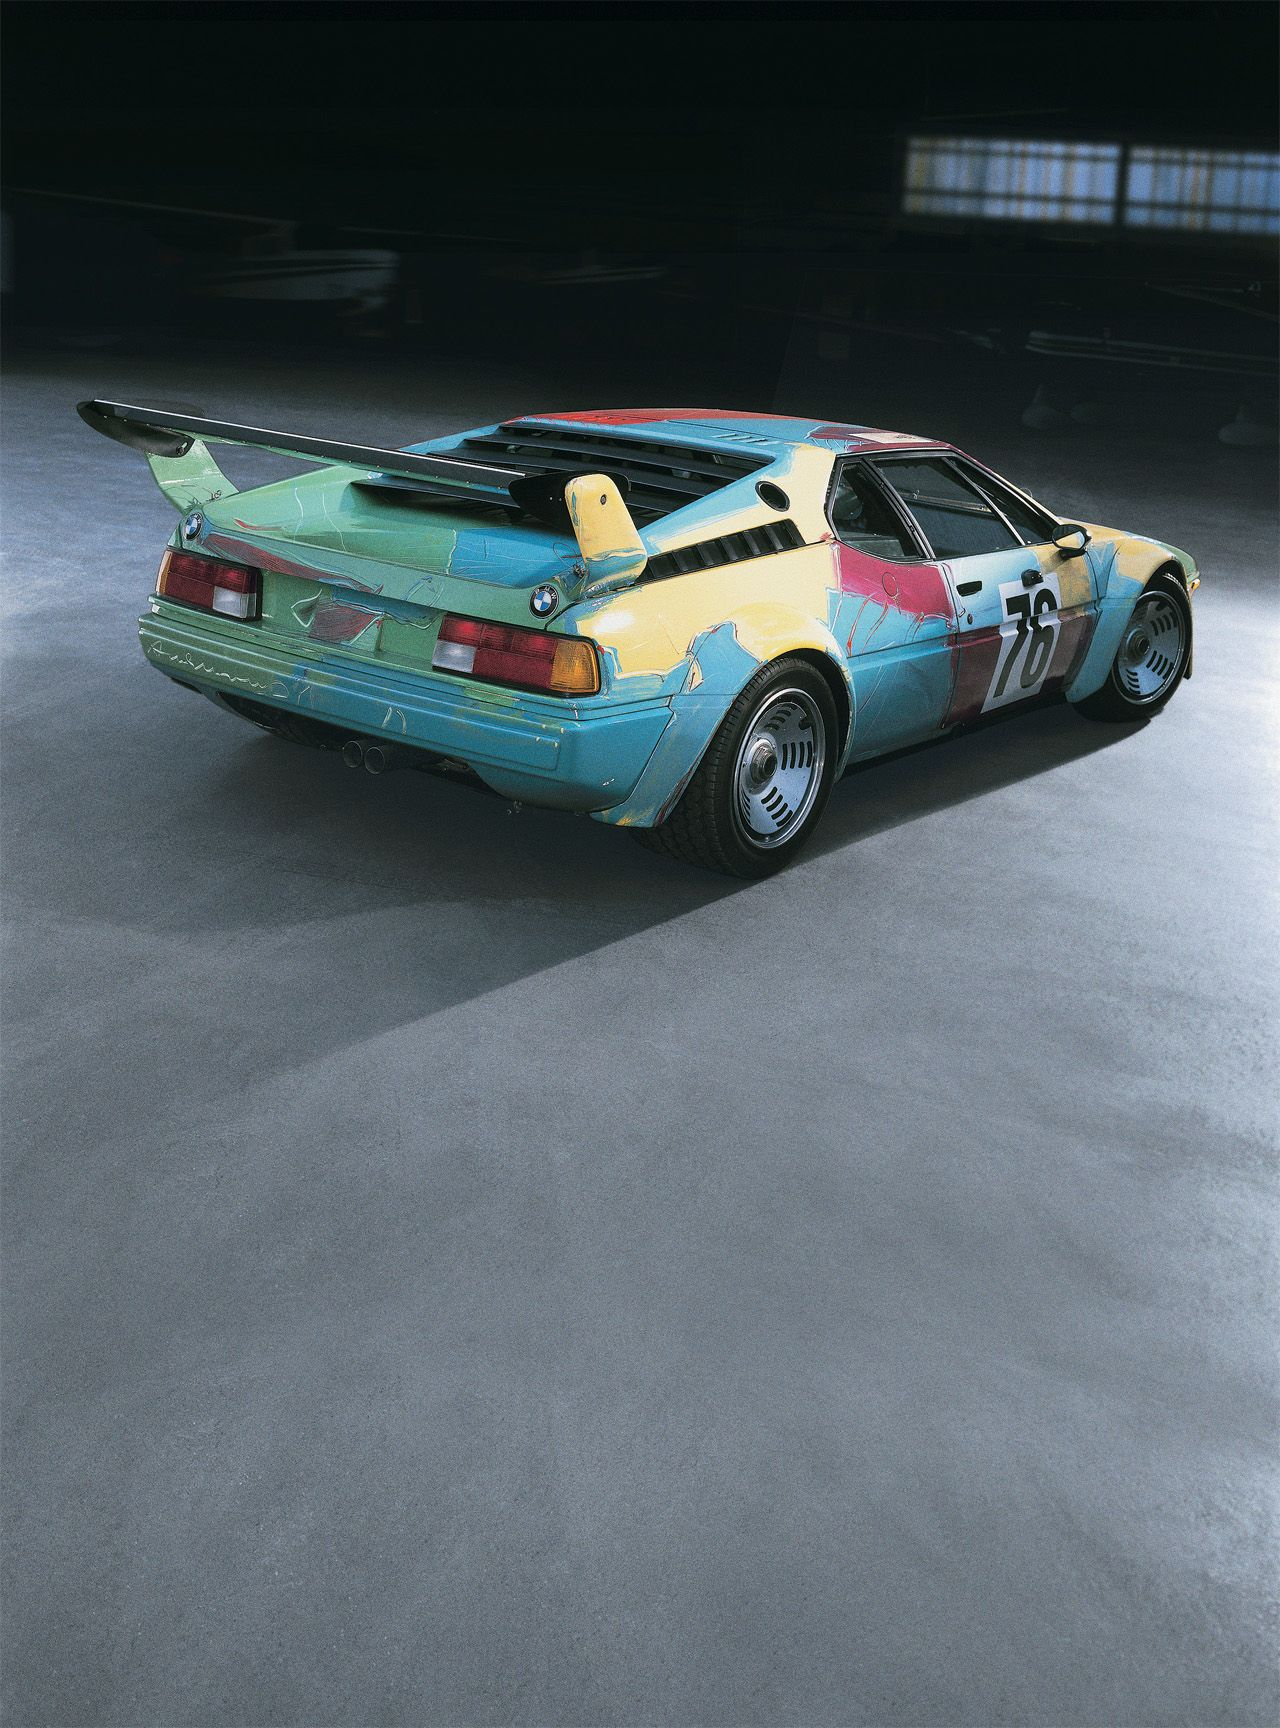 BMW M1 - Andy Warhol's art car #petrolified